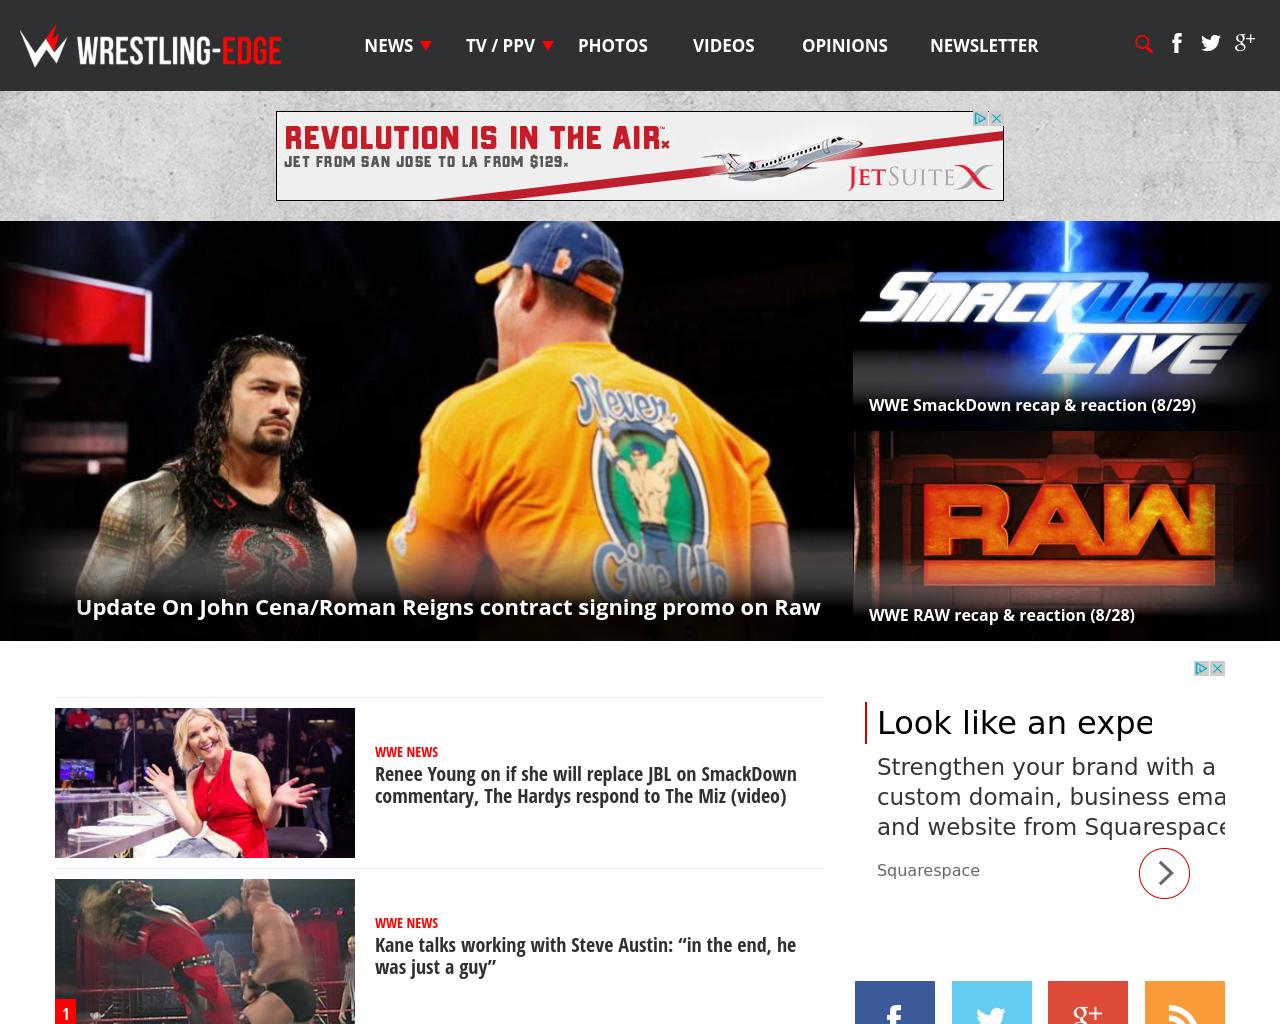 WWE-Wrestling-Edge-Advertising-Reviews-Pricing